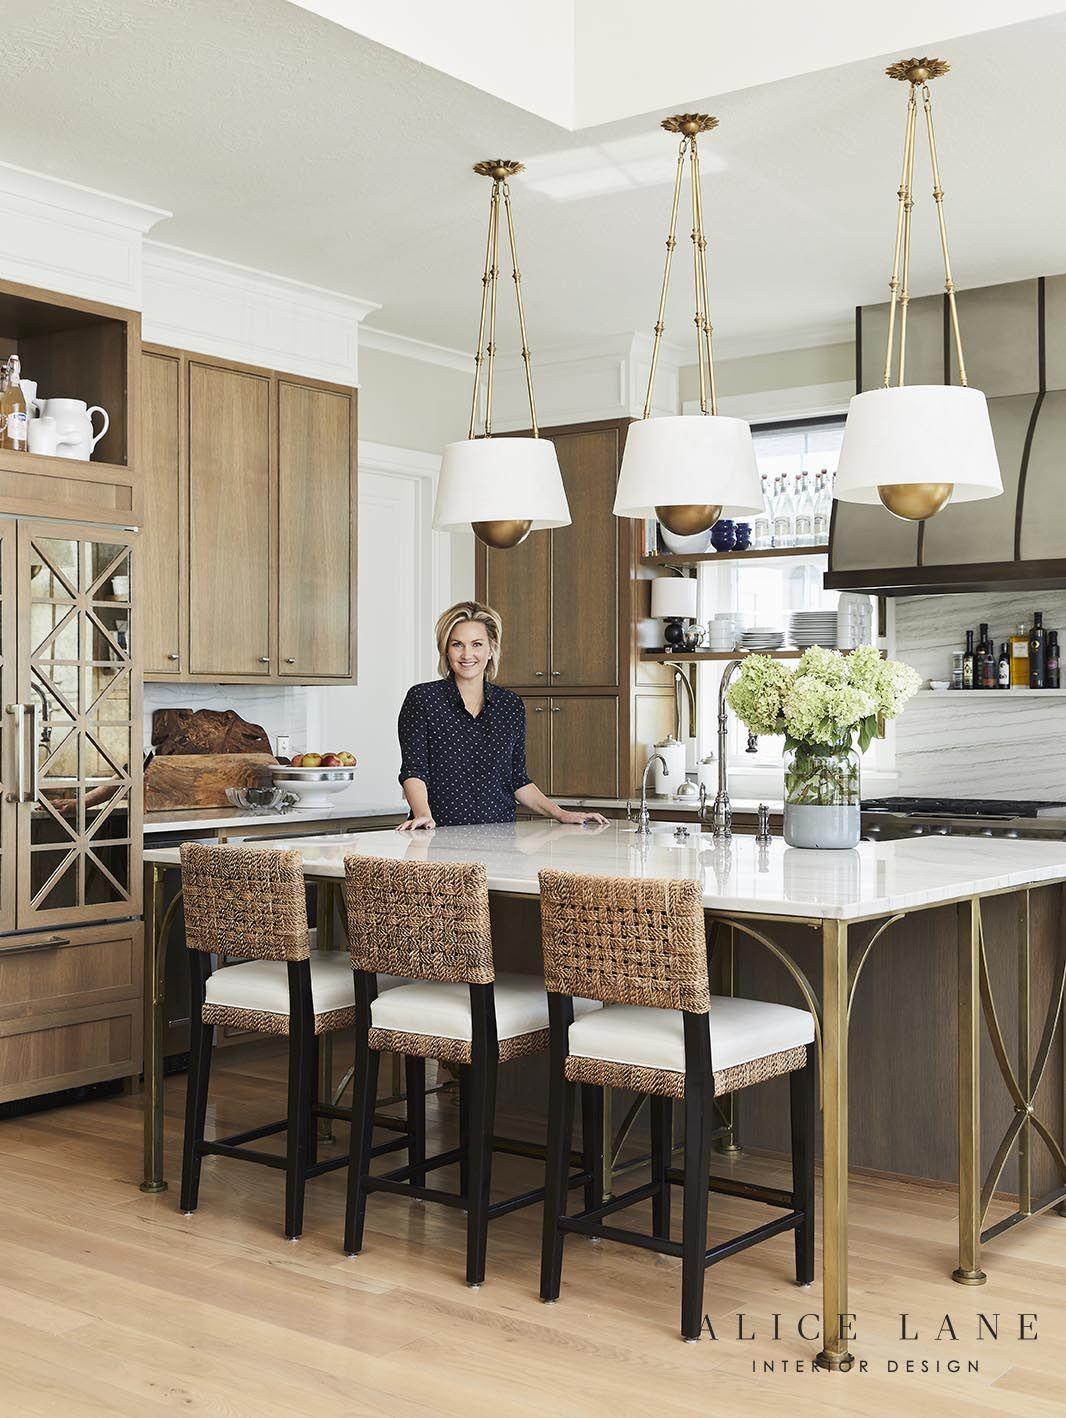 Home Of Jessica Bennett Kitchen Cabinets Decor Home Interior